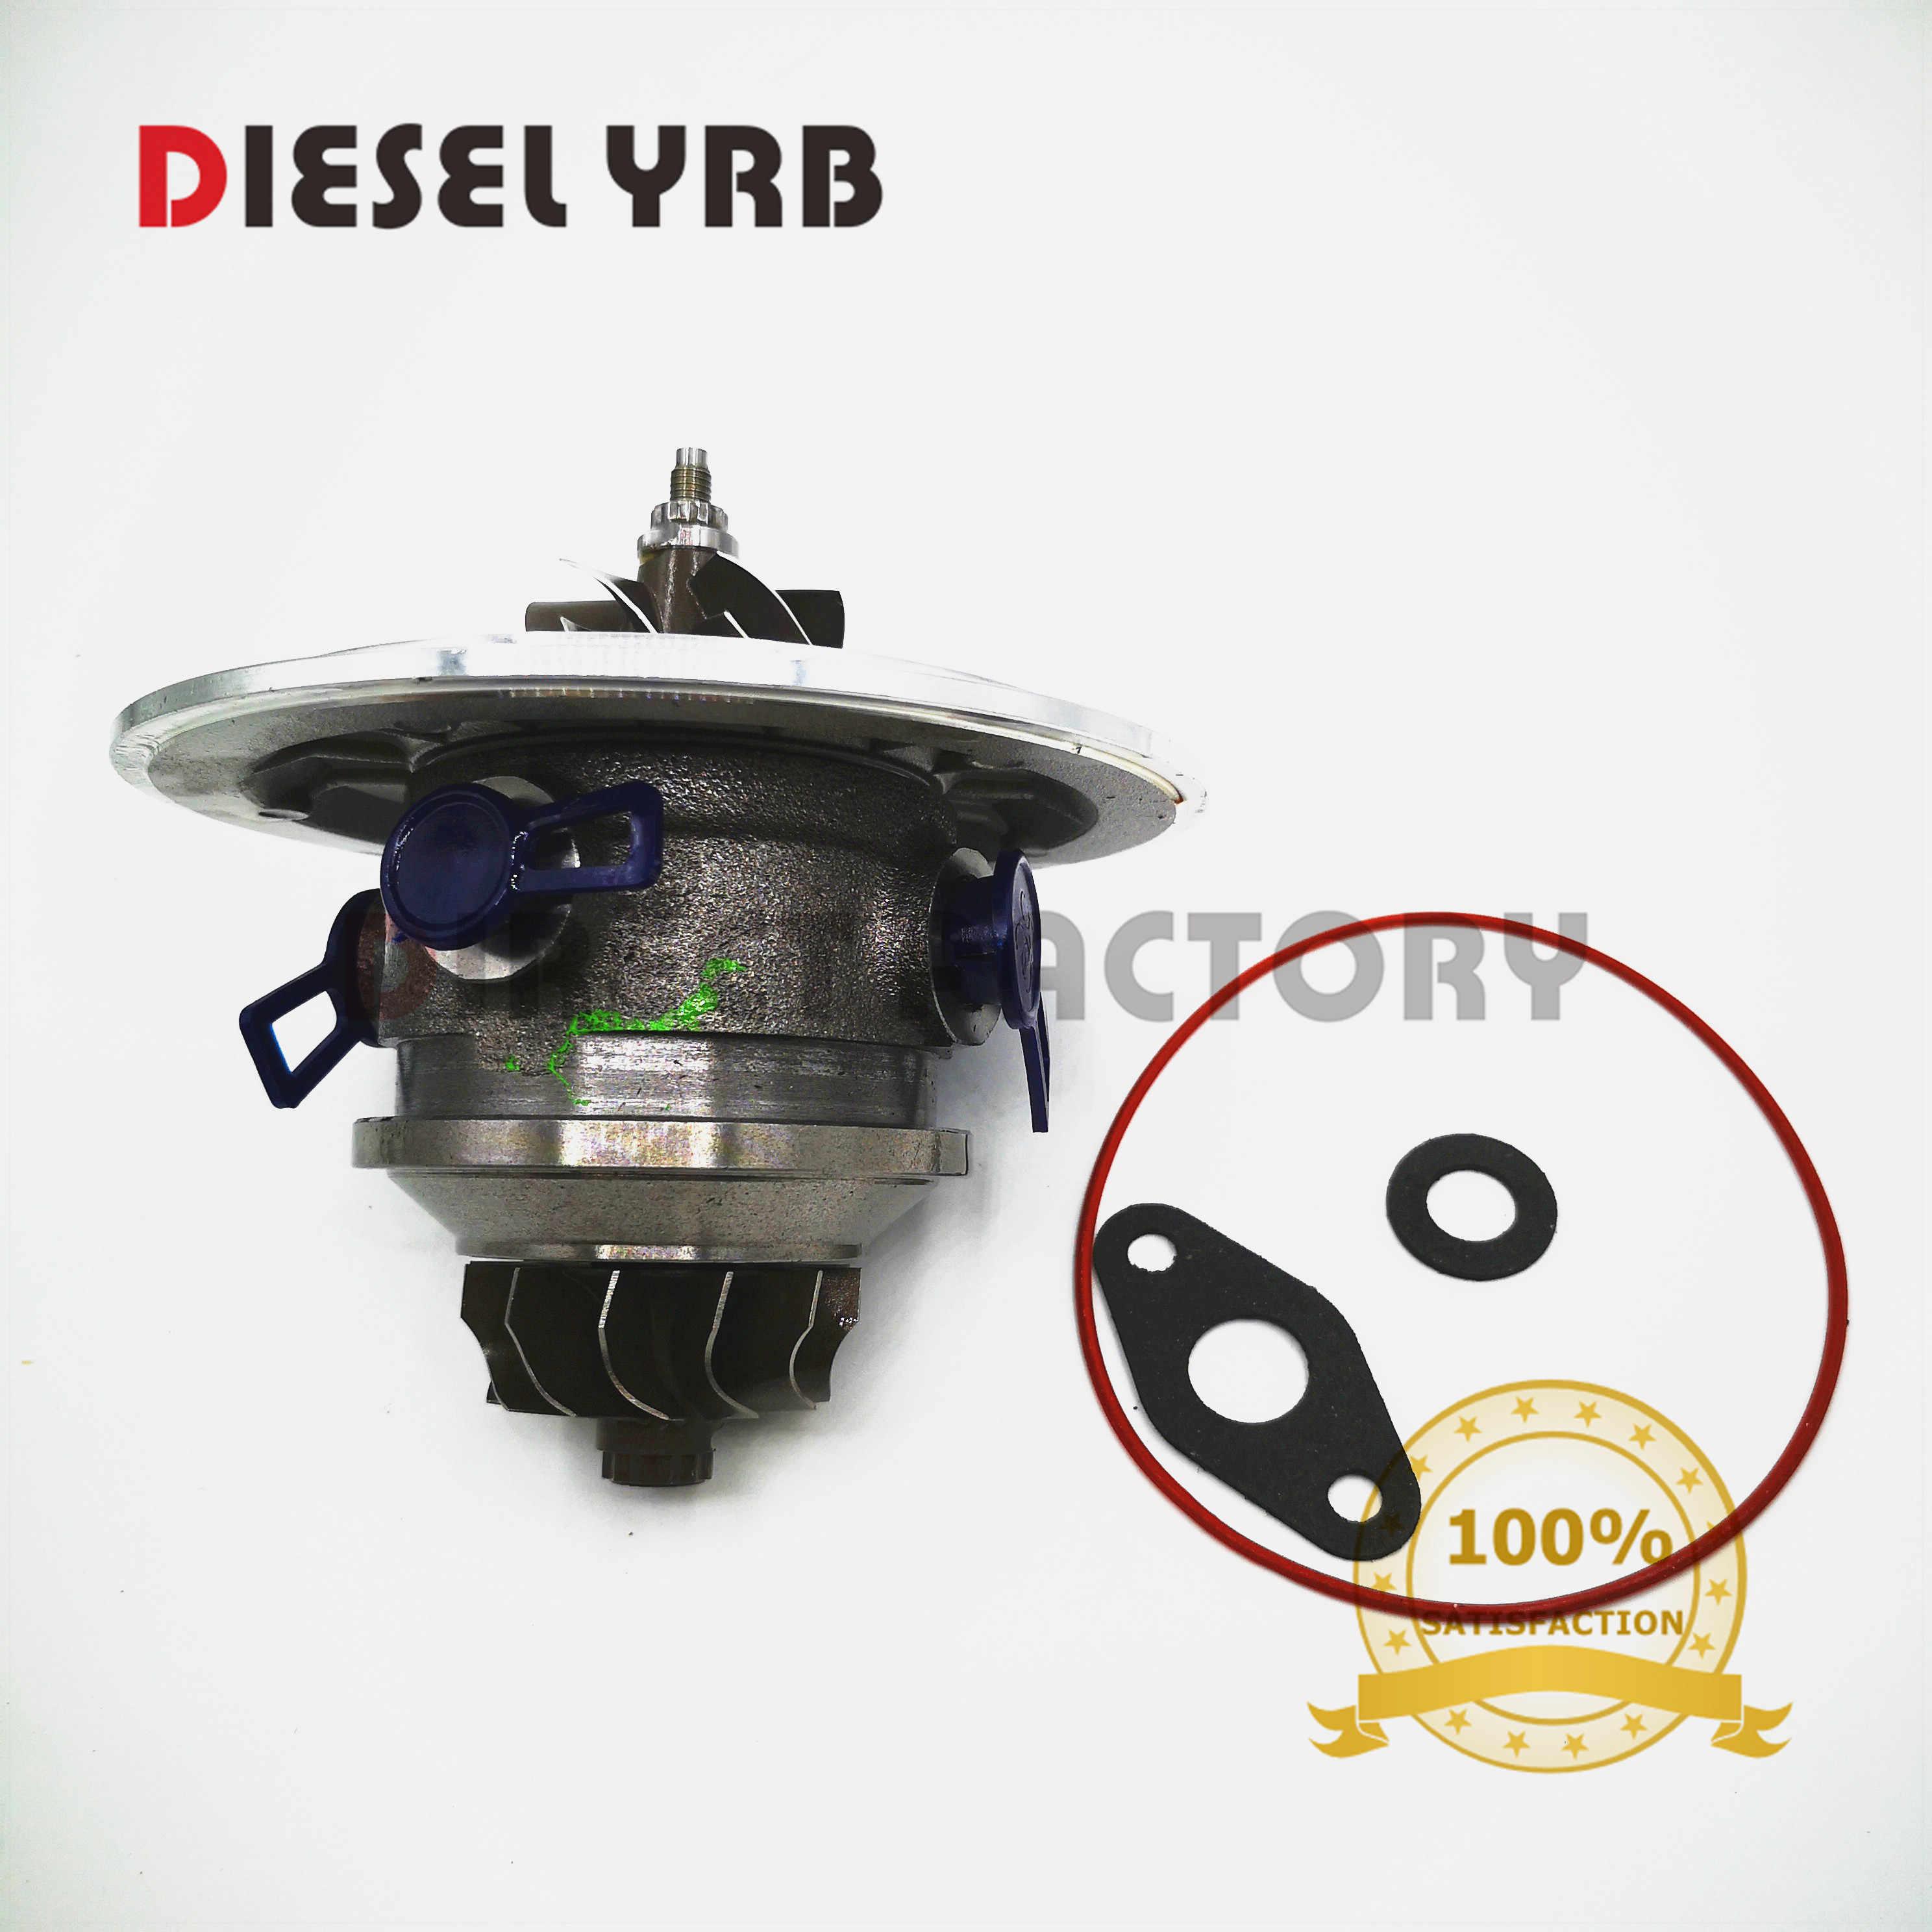 Turbo CHRA TD04 28200-42560 /716938-5001S/716938 Turbo charger for Hyundai